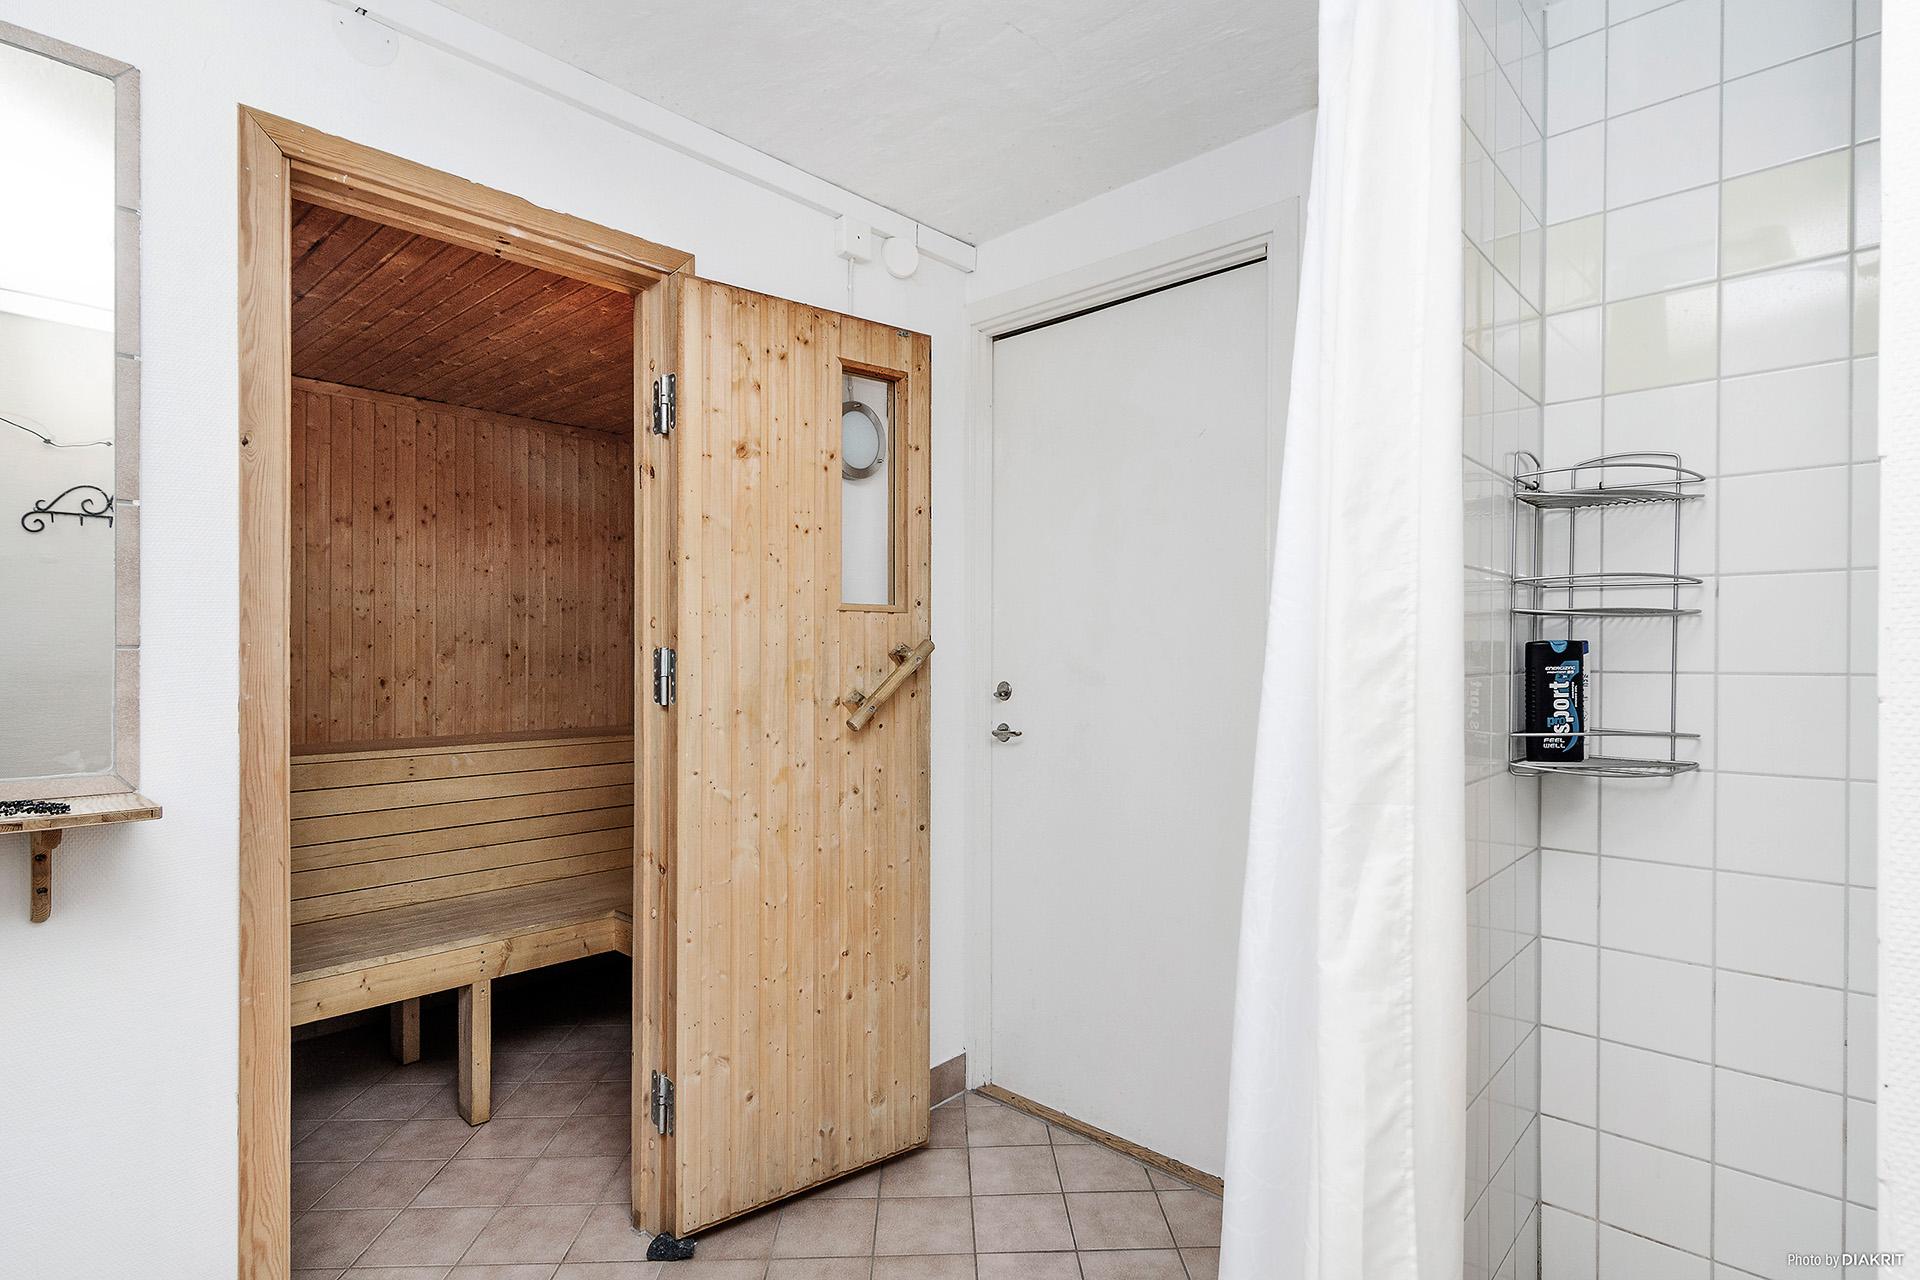 Gemensam dusch/bastu i källaren.